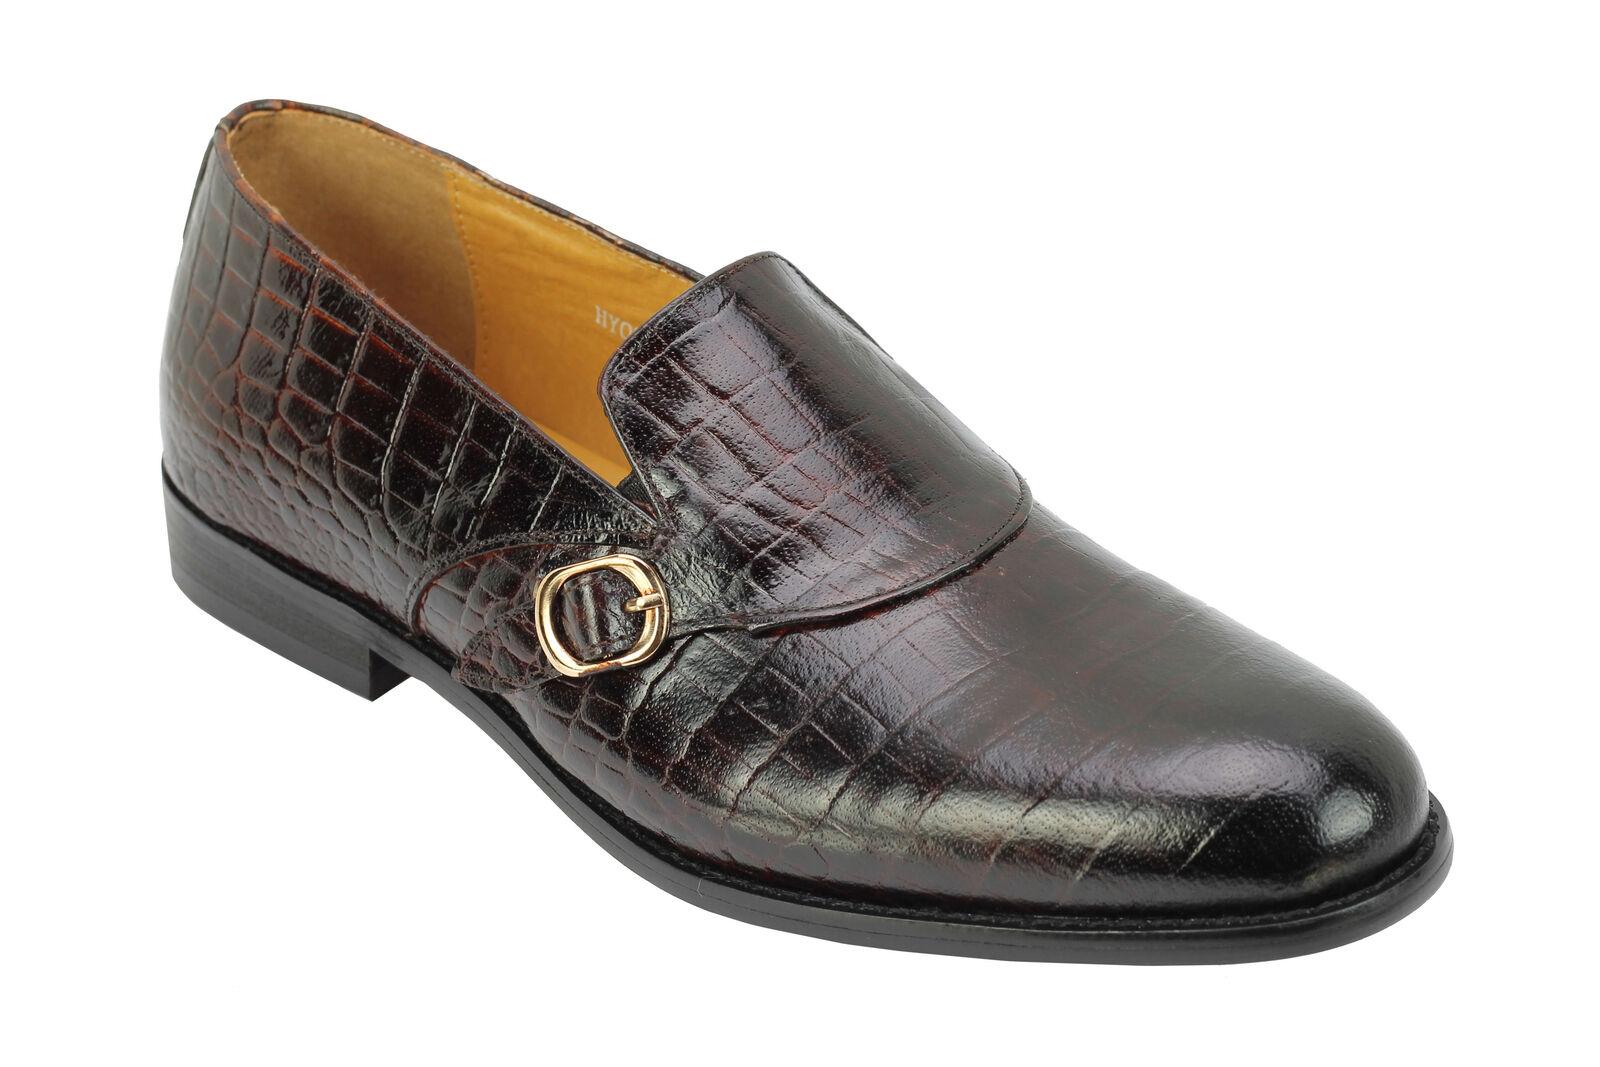 Herren Retro Real Leder Schuhes Braun Crocodile Skin Skin Crocodile Print Vintage Smart Loafers 0cdd5d